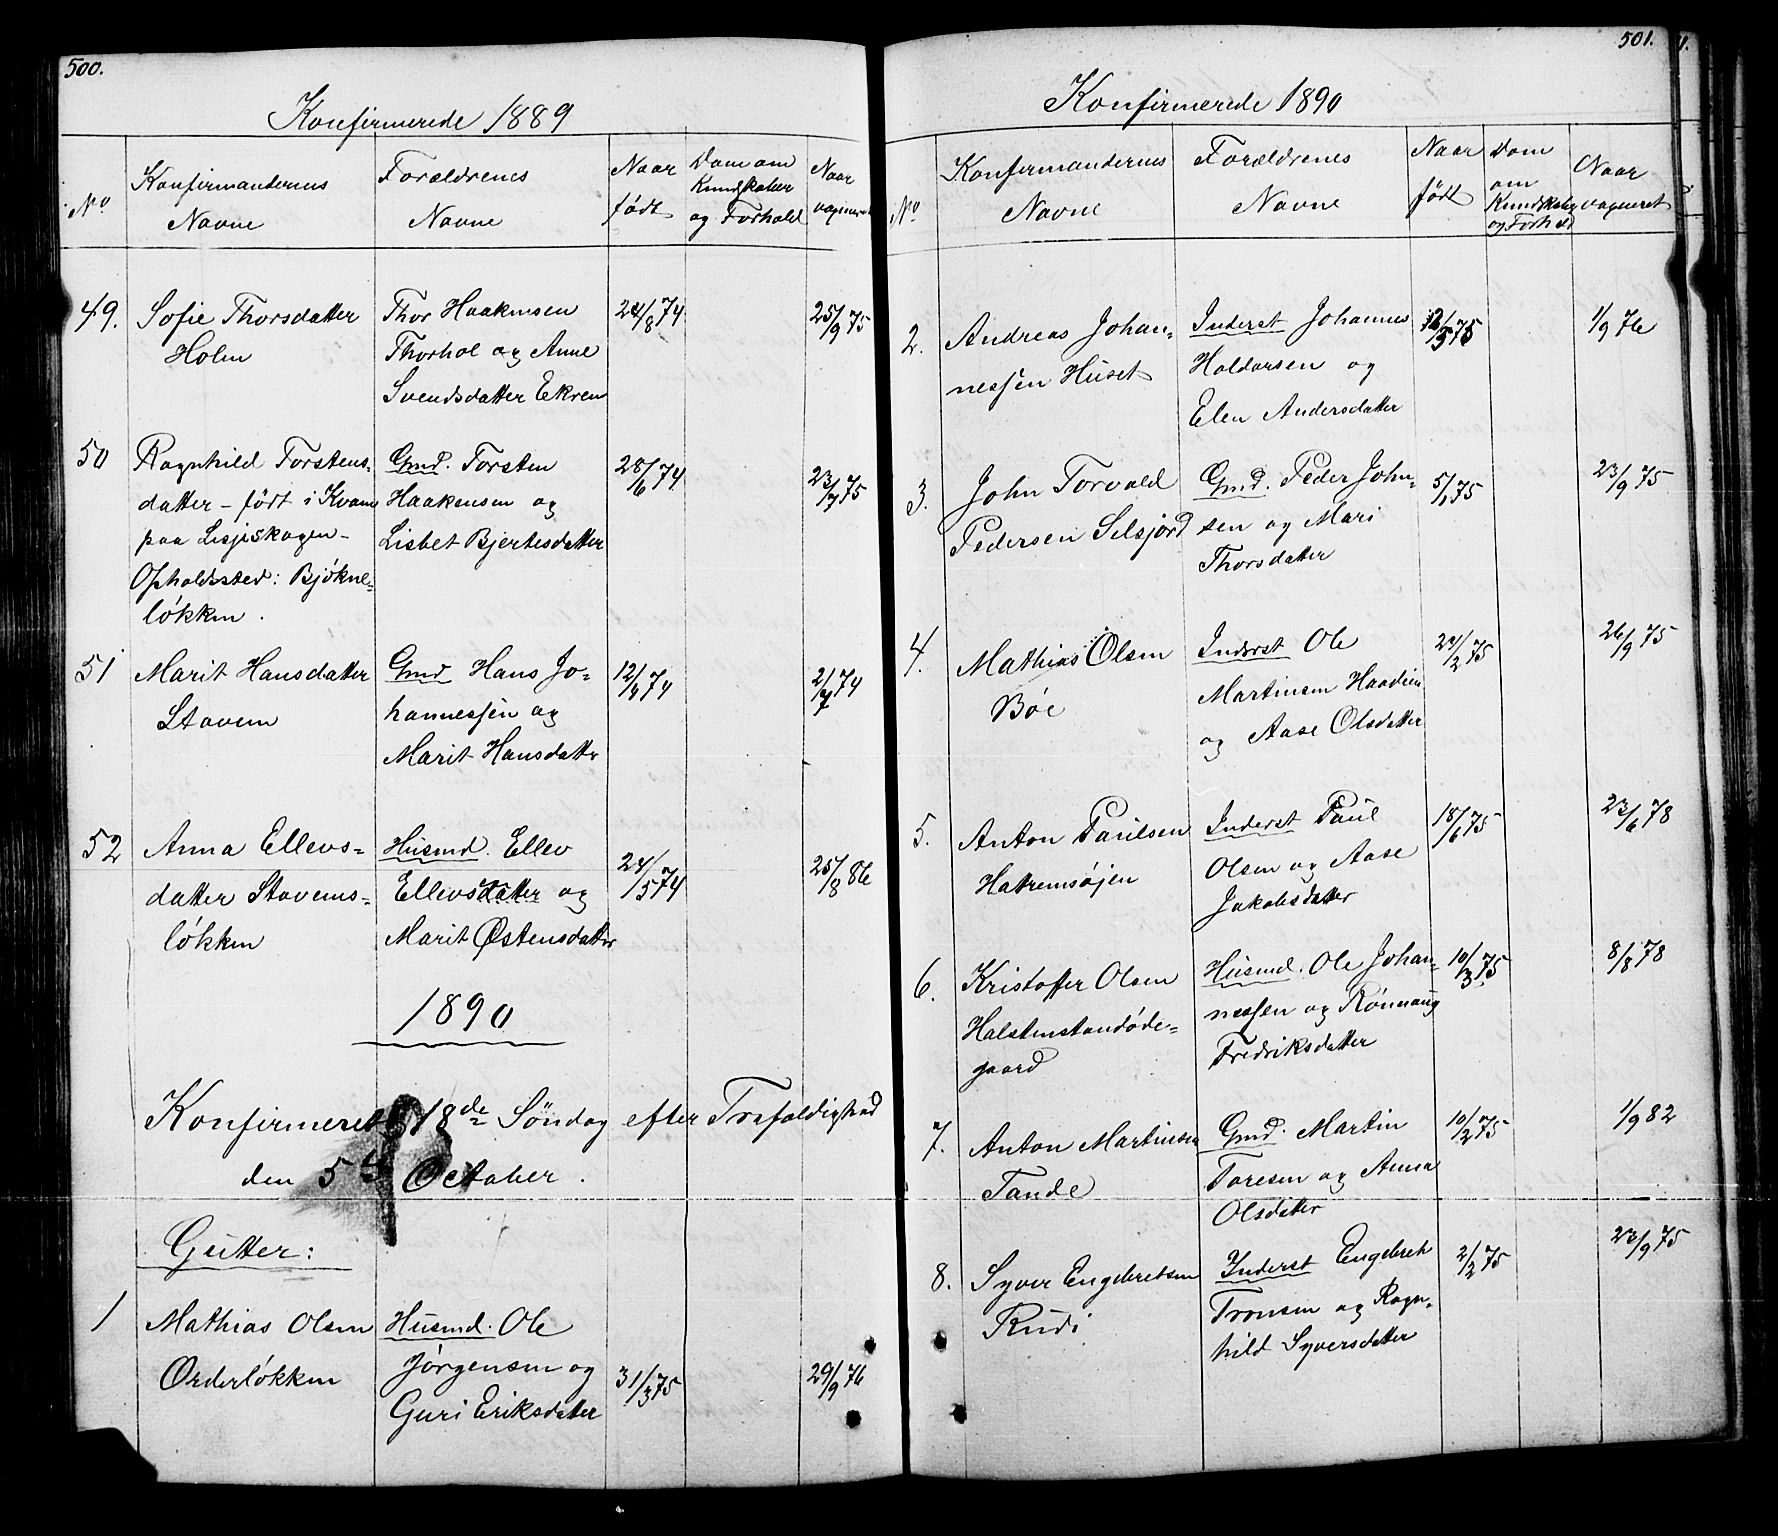 SAH, Lesja prestekontor, Klokkerbok nr. 5, 1850-1894, s. 500-501